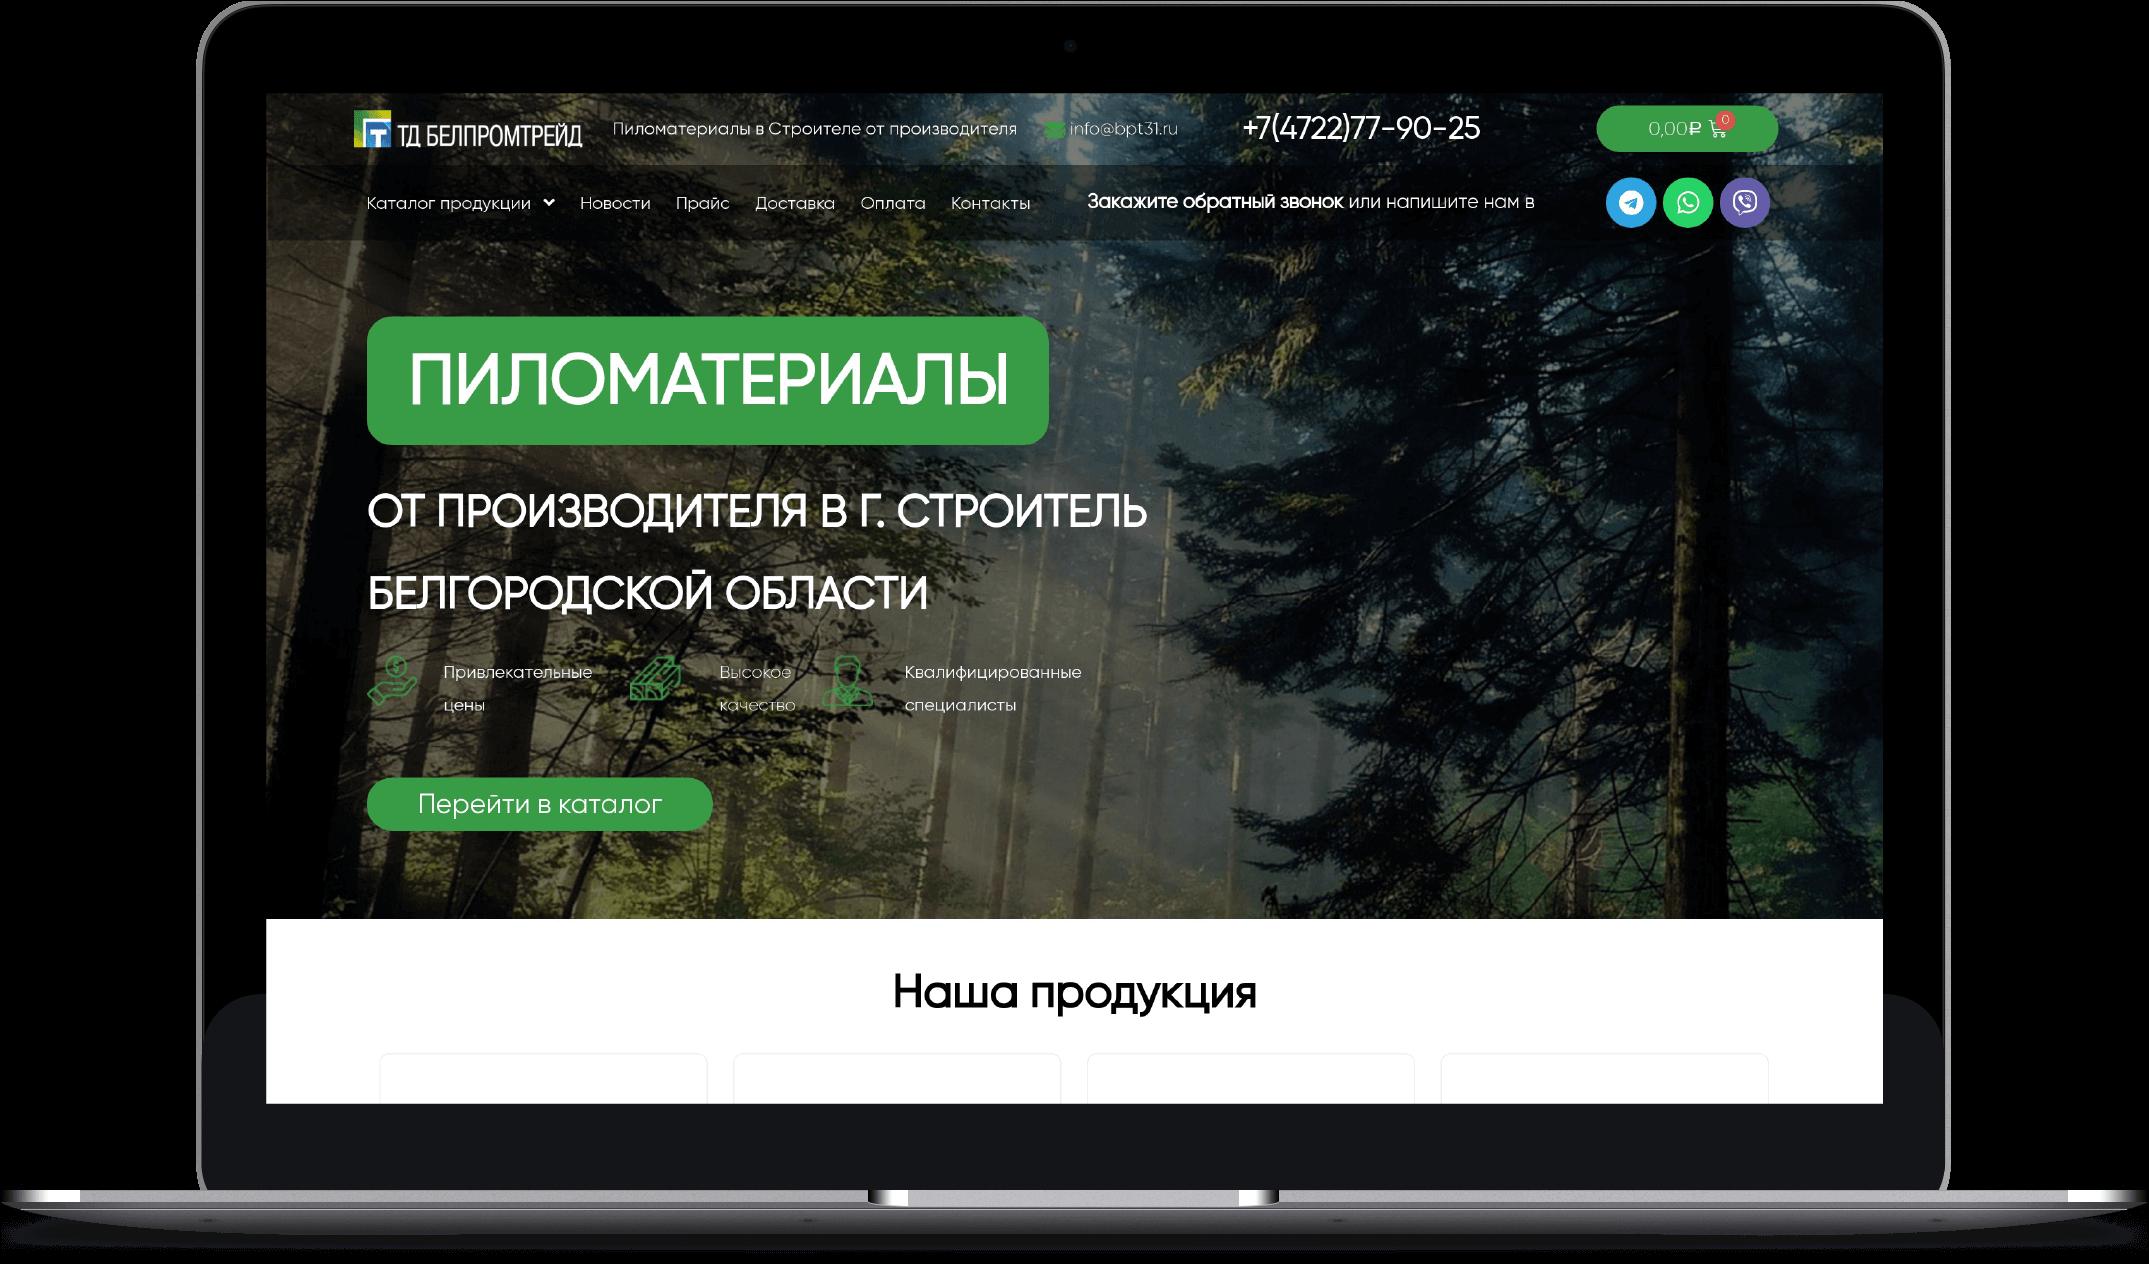 Разработка онлайн-магазина для продажи пиломатериалов